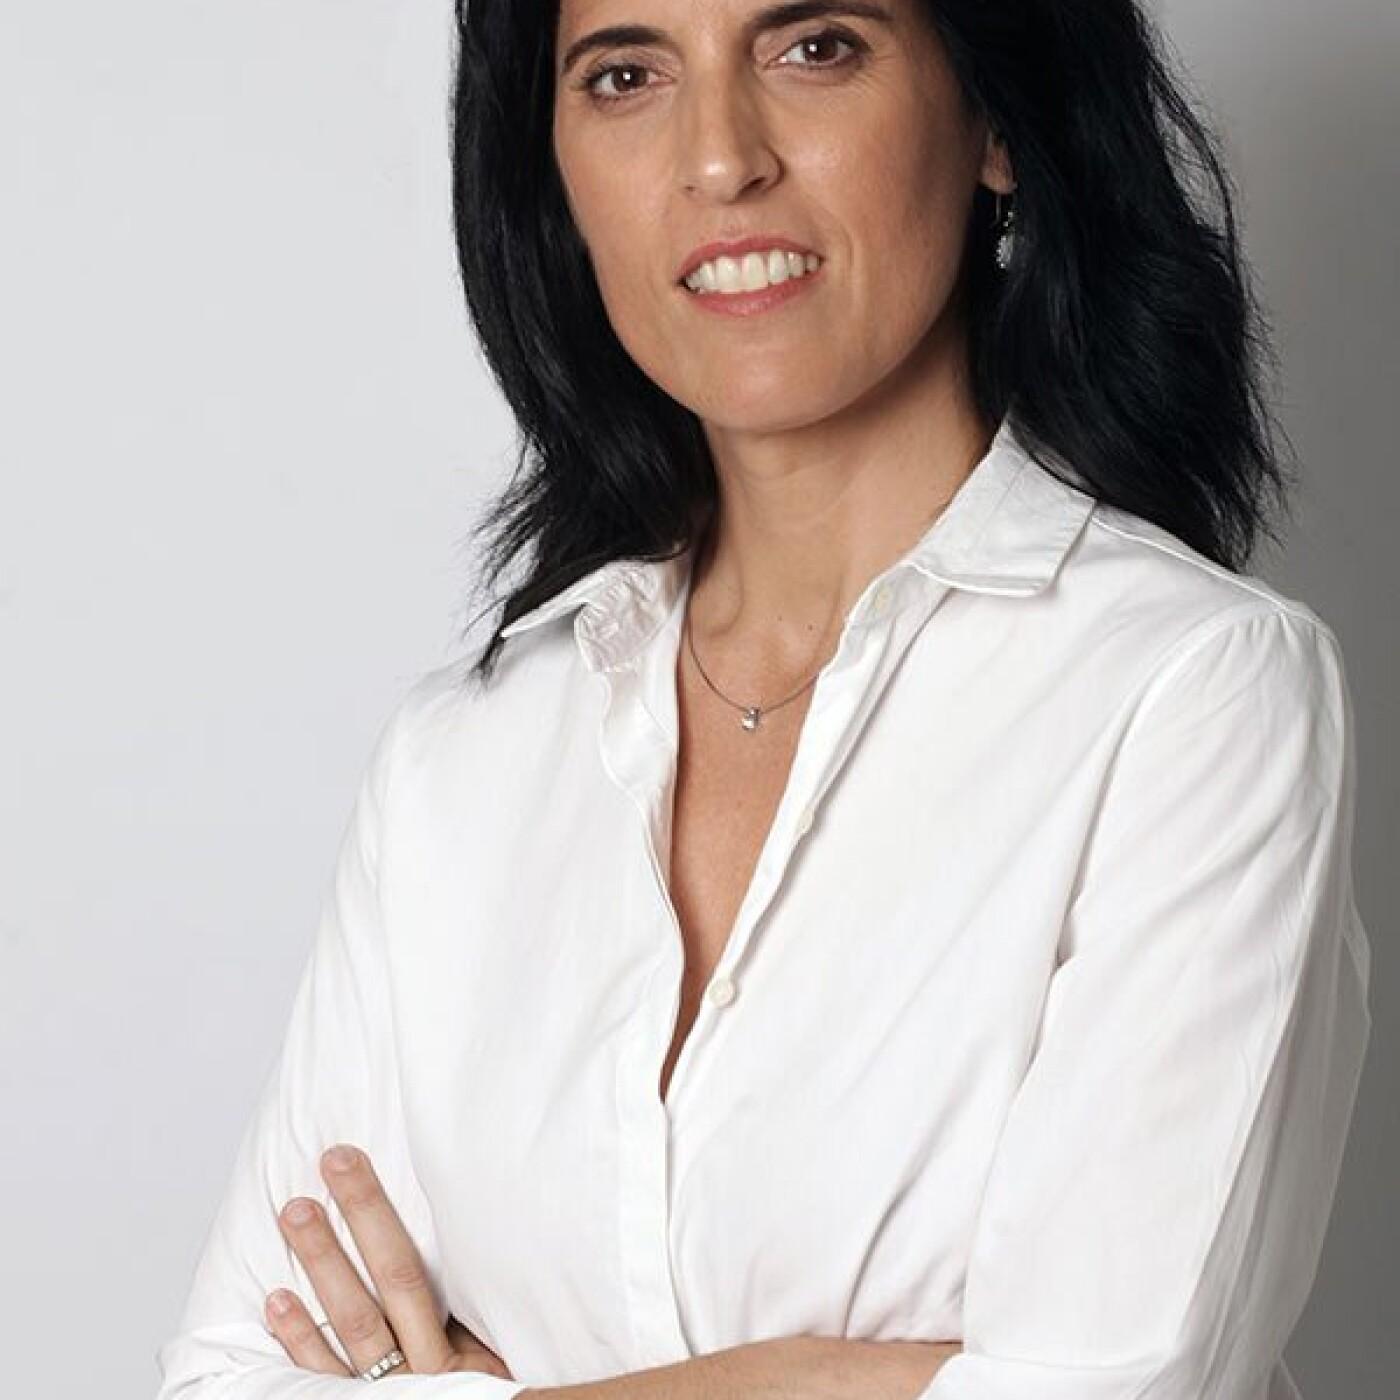 Lucia est psychologue, France - 02 07 2021 - StereoChic Radio